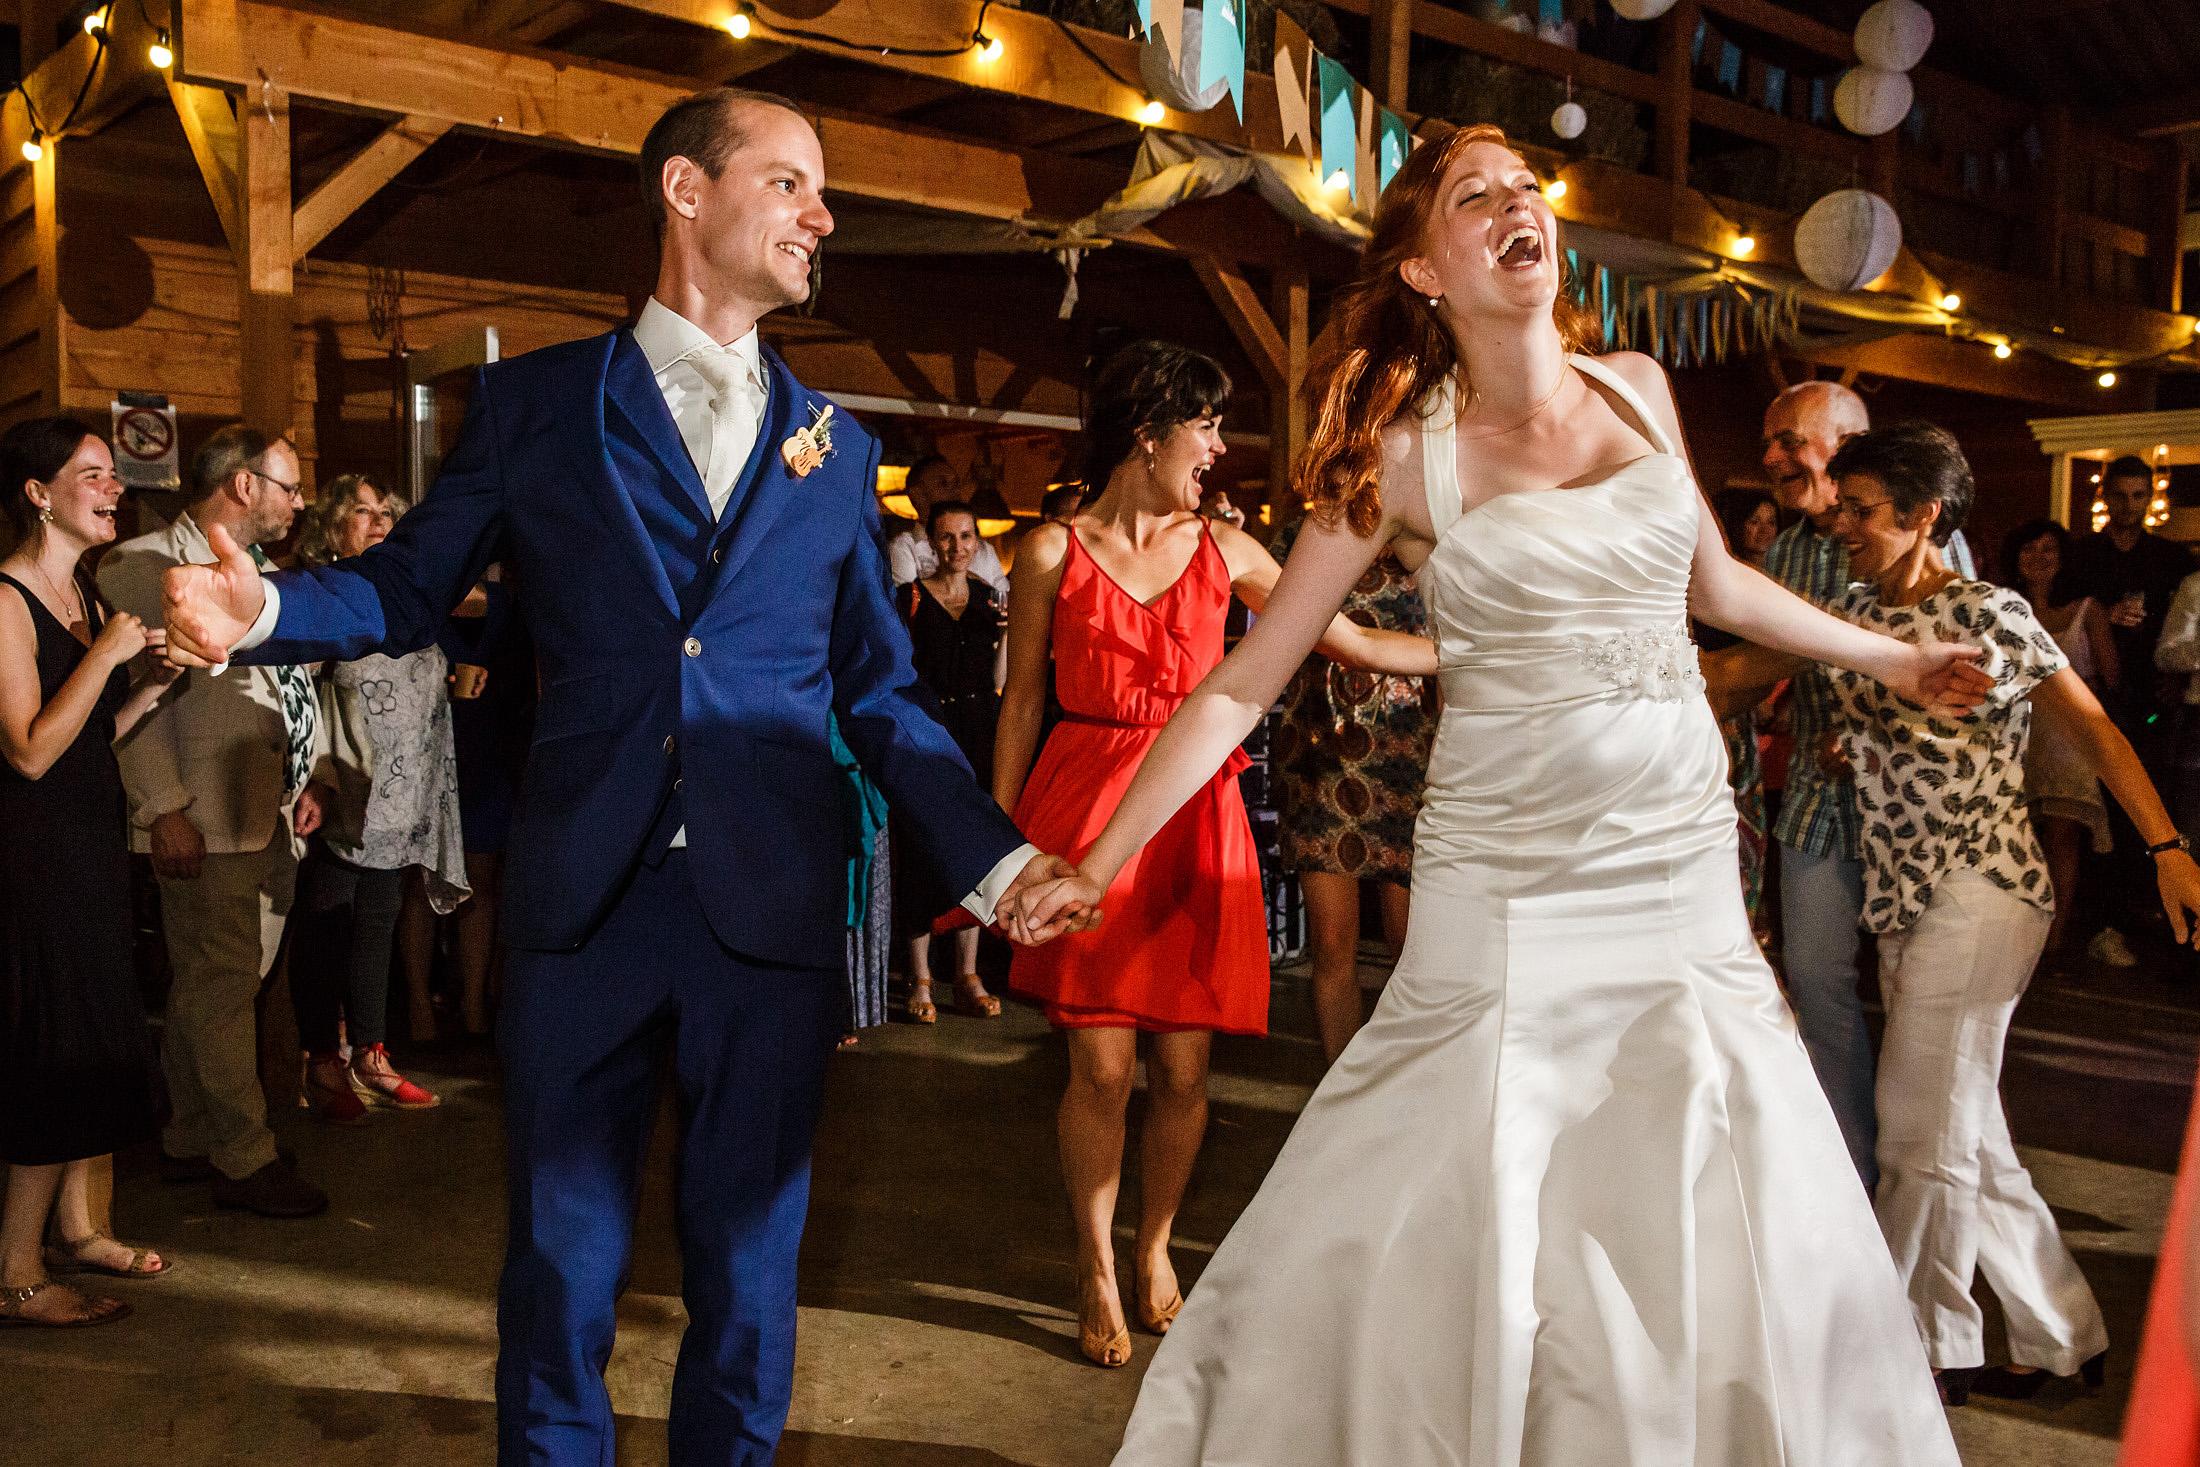 38-Bruiloft-Feest